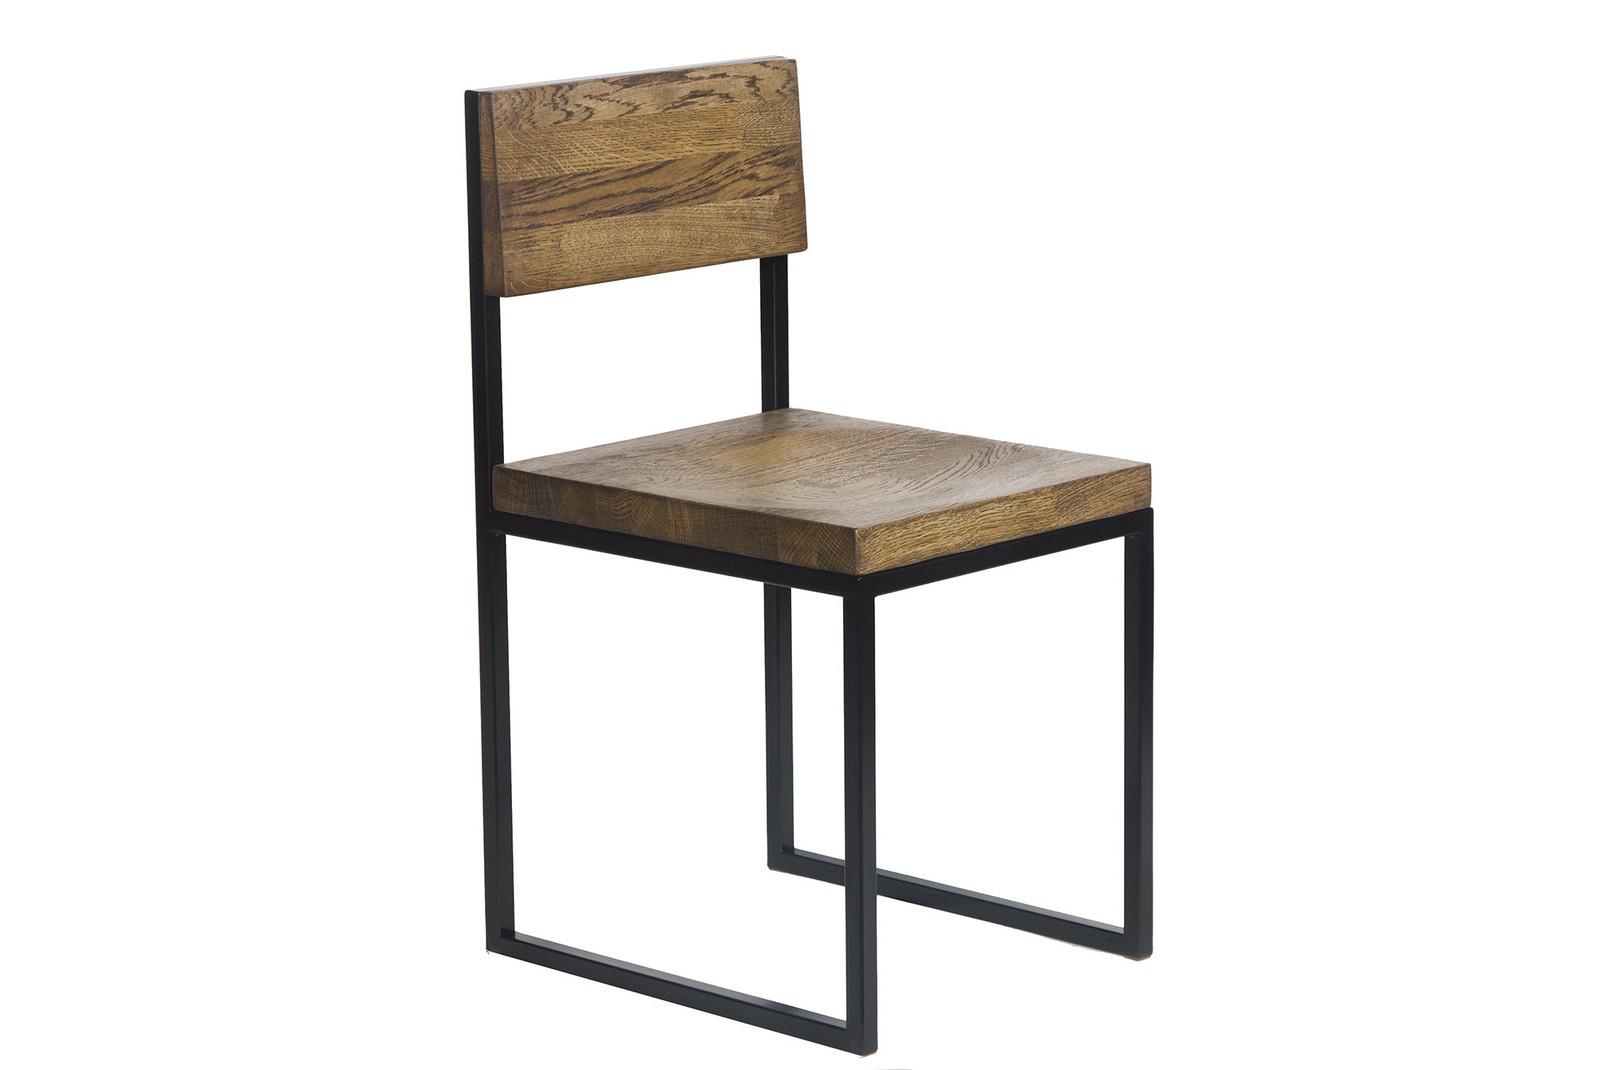 Кухонный стул Archpole 15430577 от thefurnish